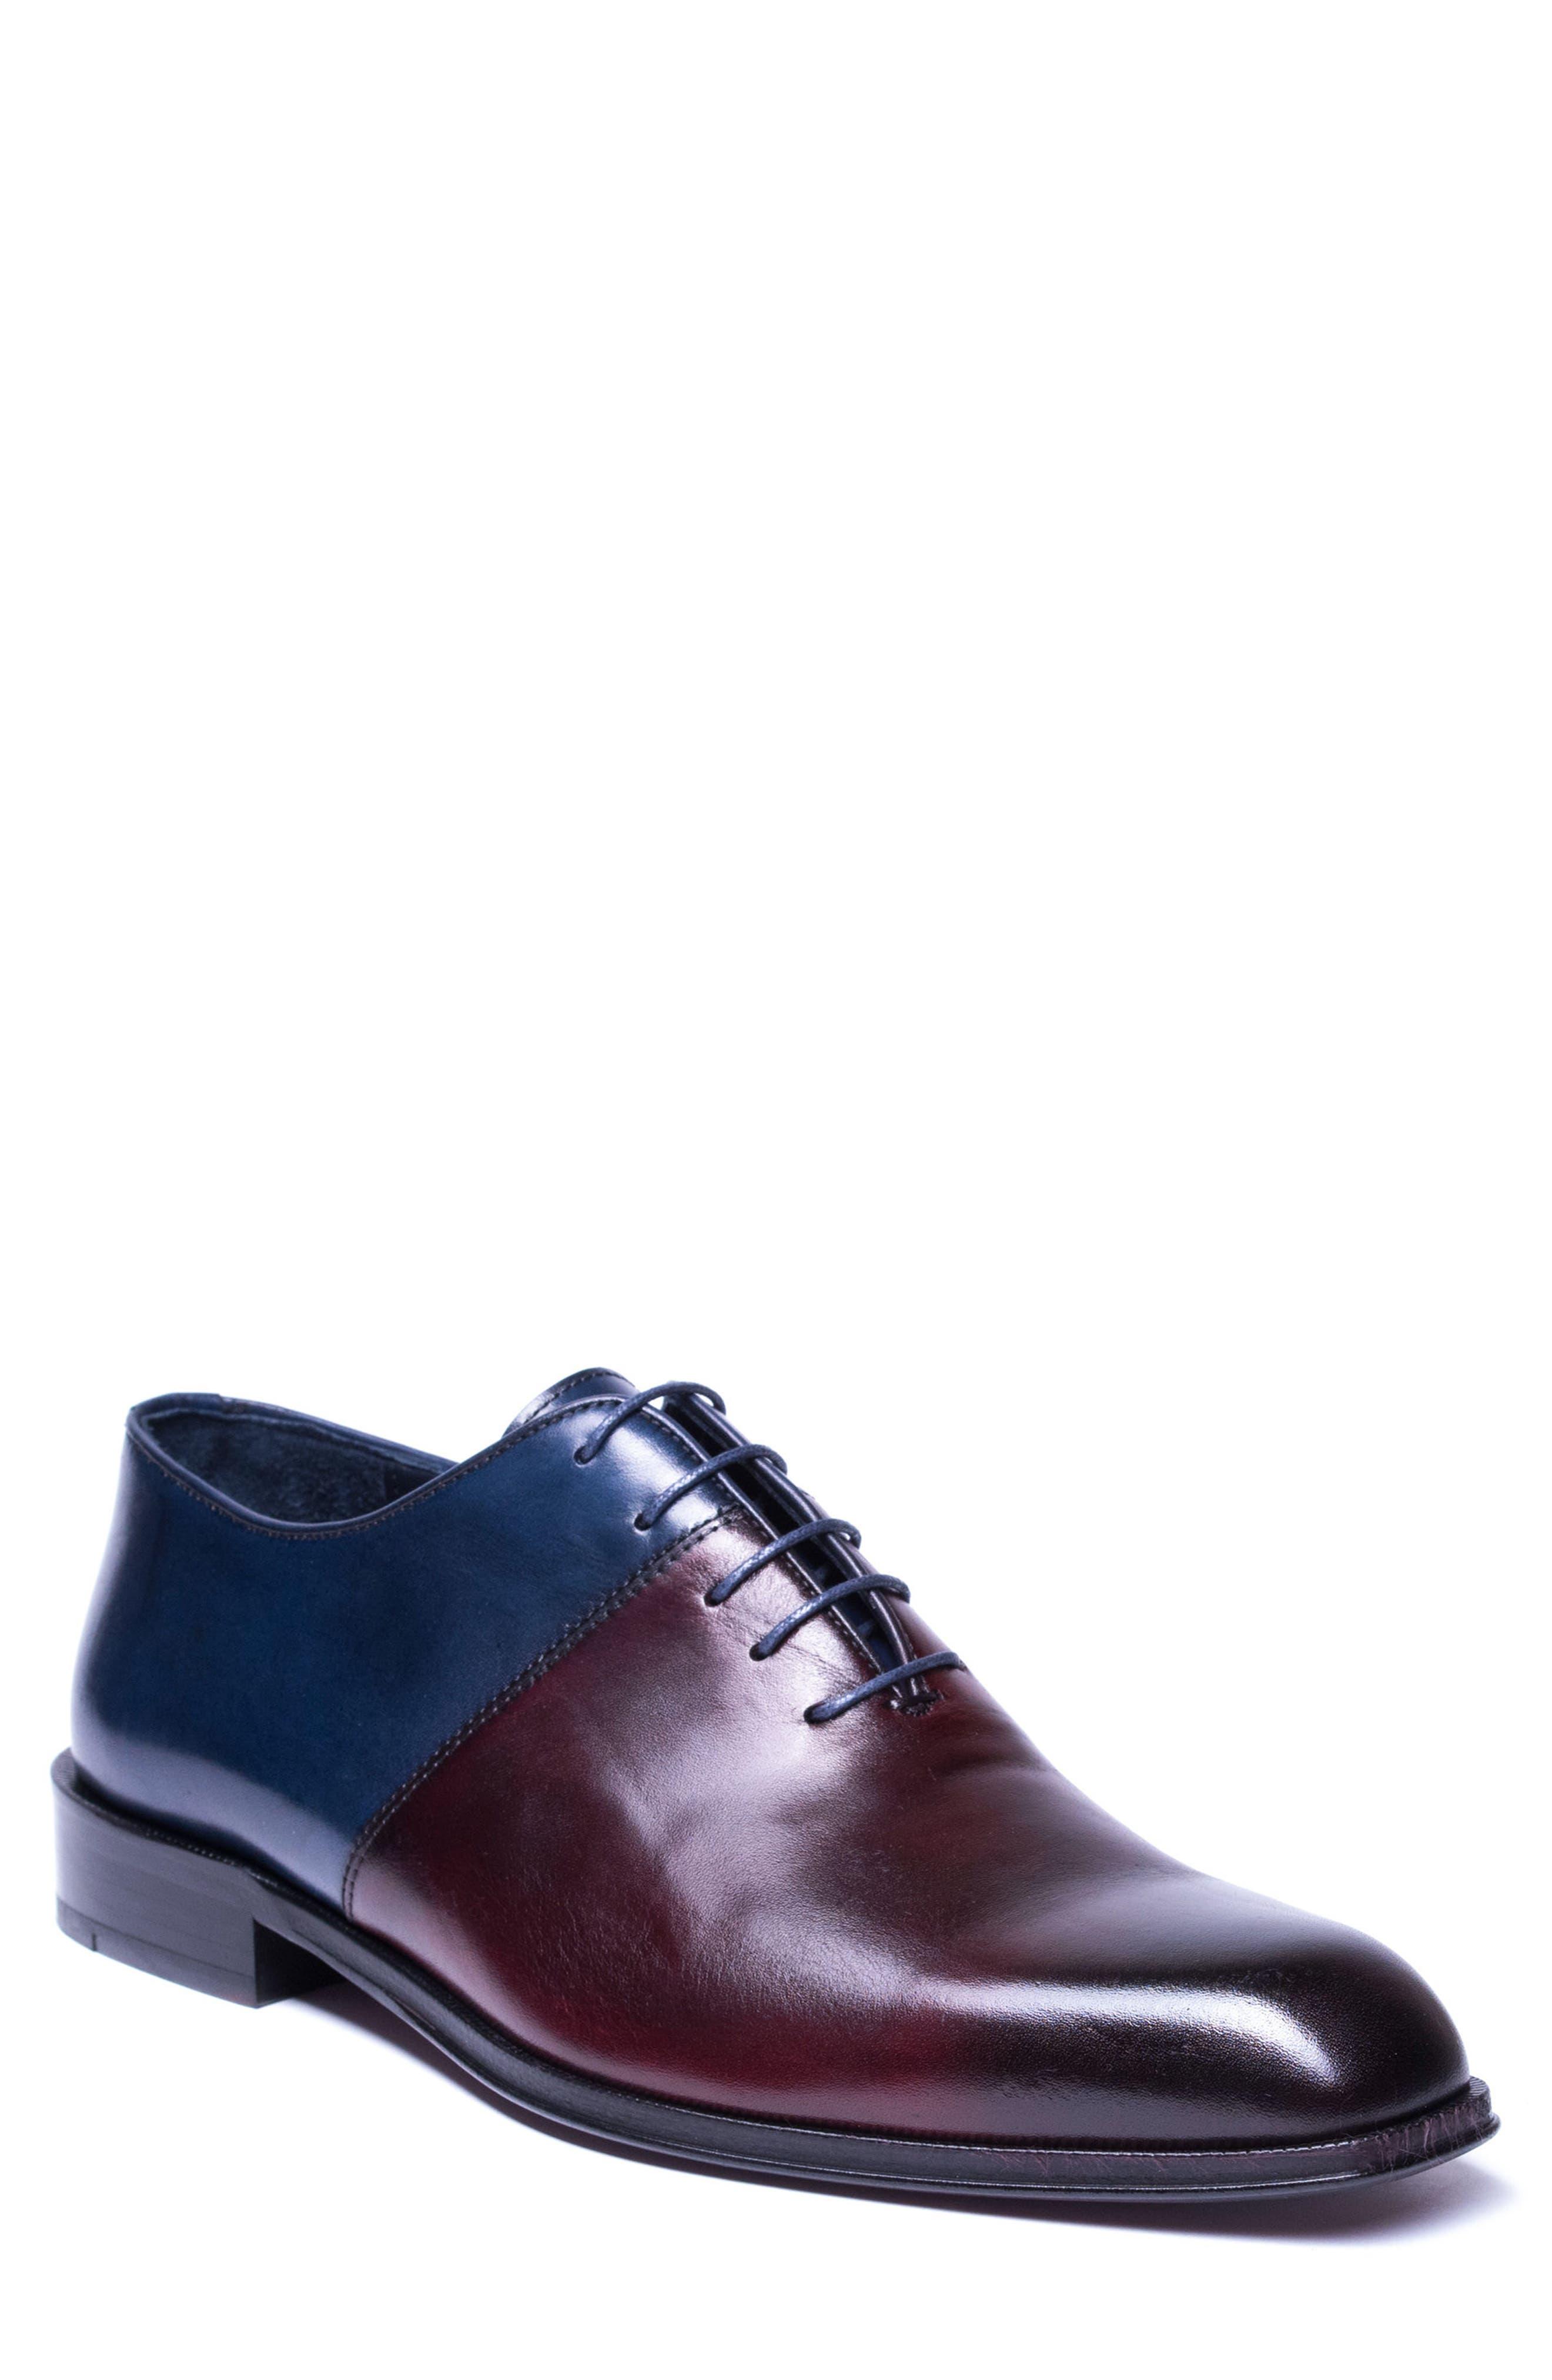 Wyatt Colorblocked Whole Cut Shoe,                         Main,                         color, Burgundy Leather